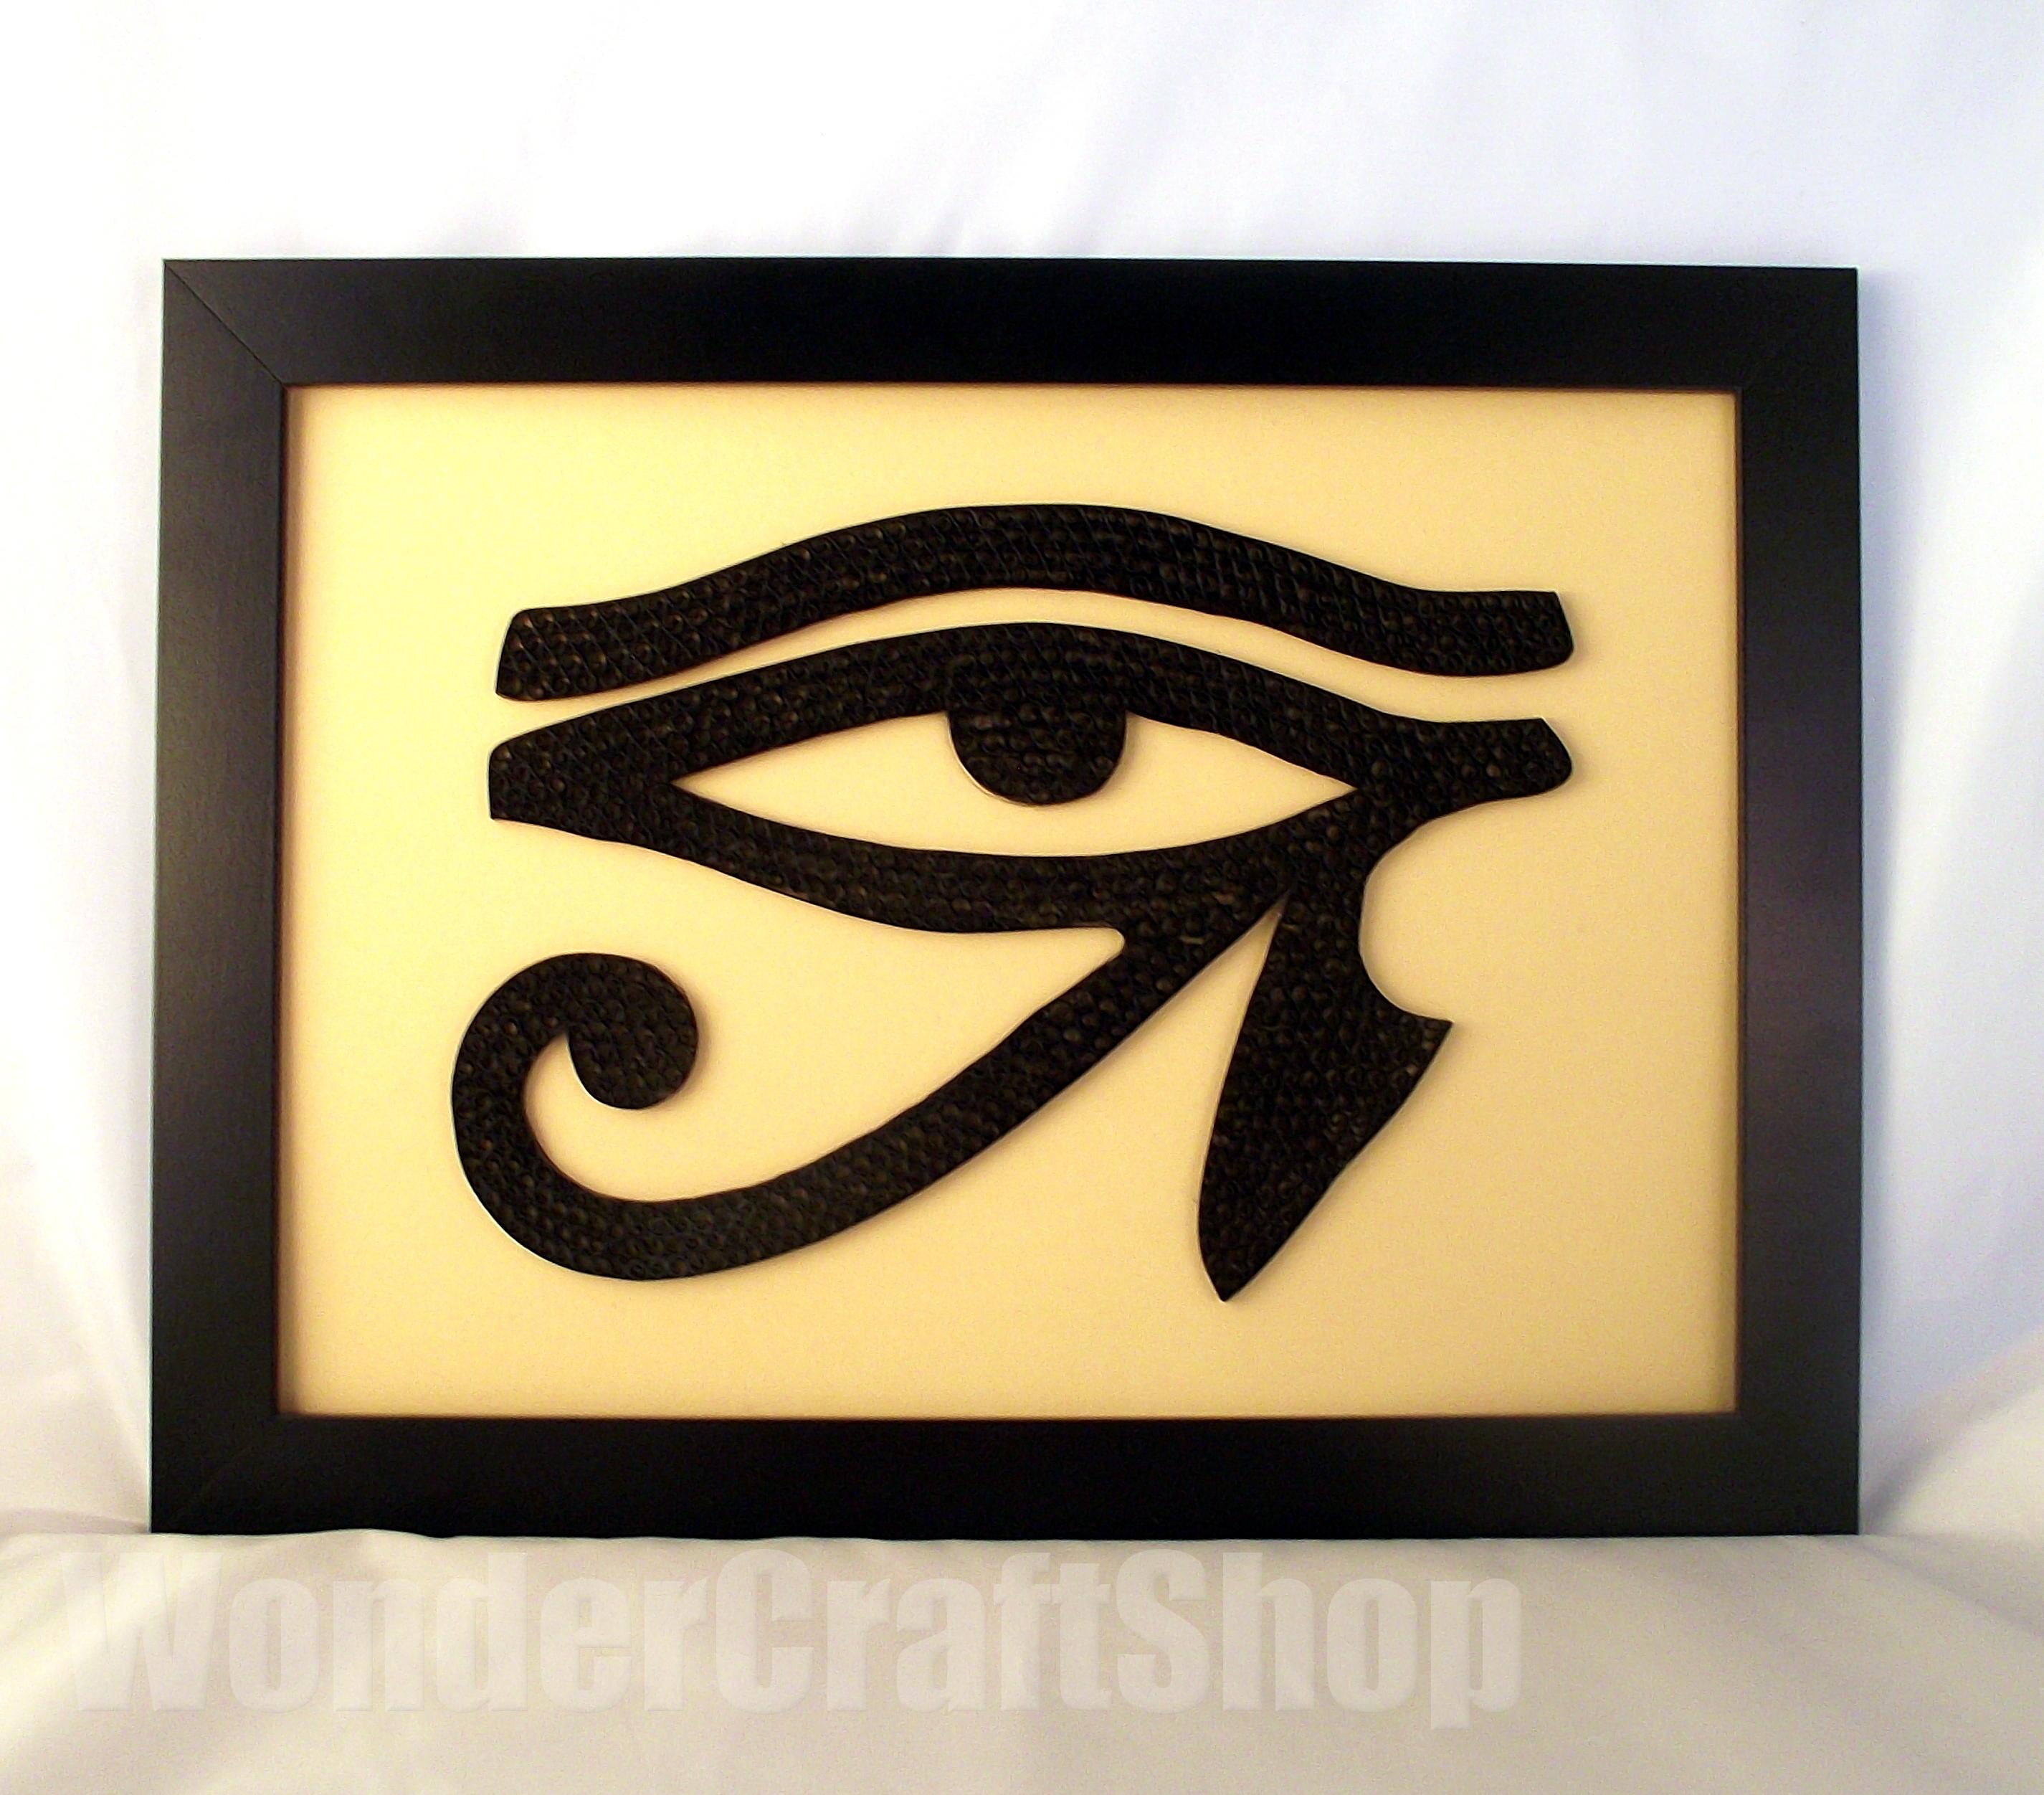 eye of ra vs eye of horus